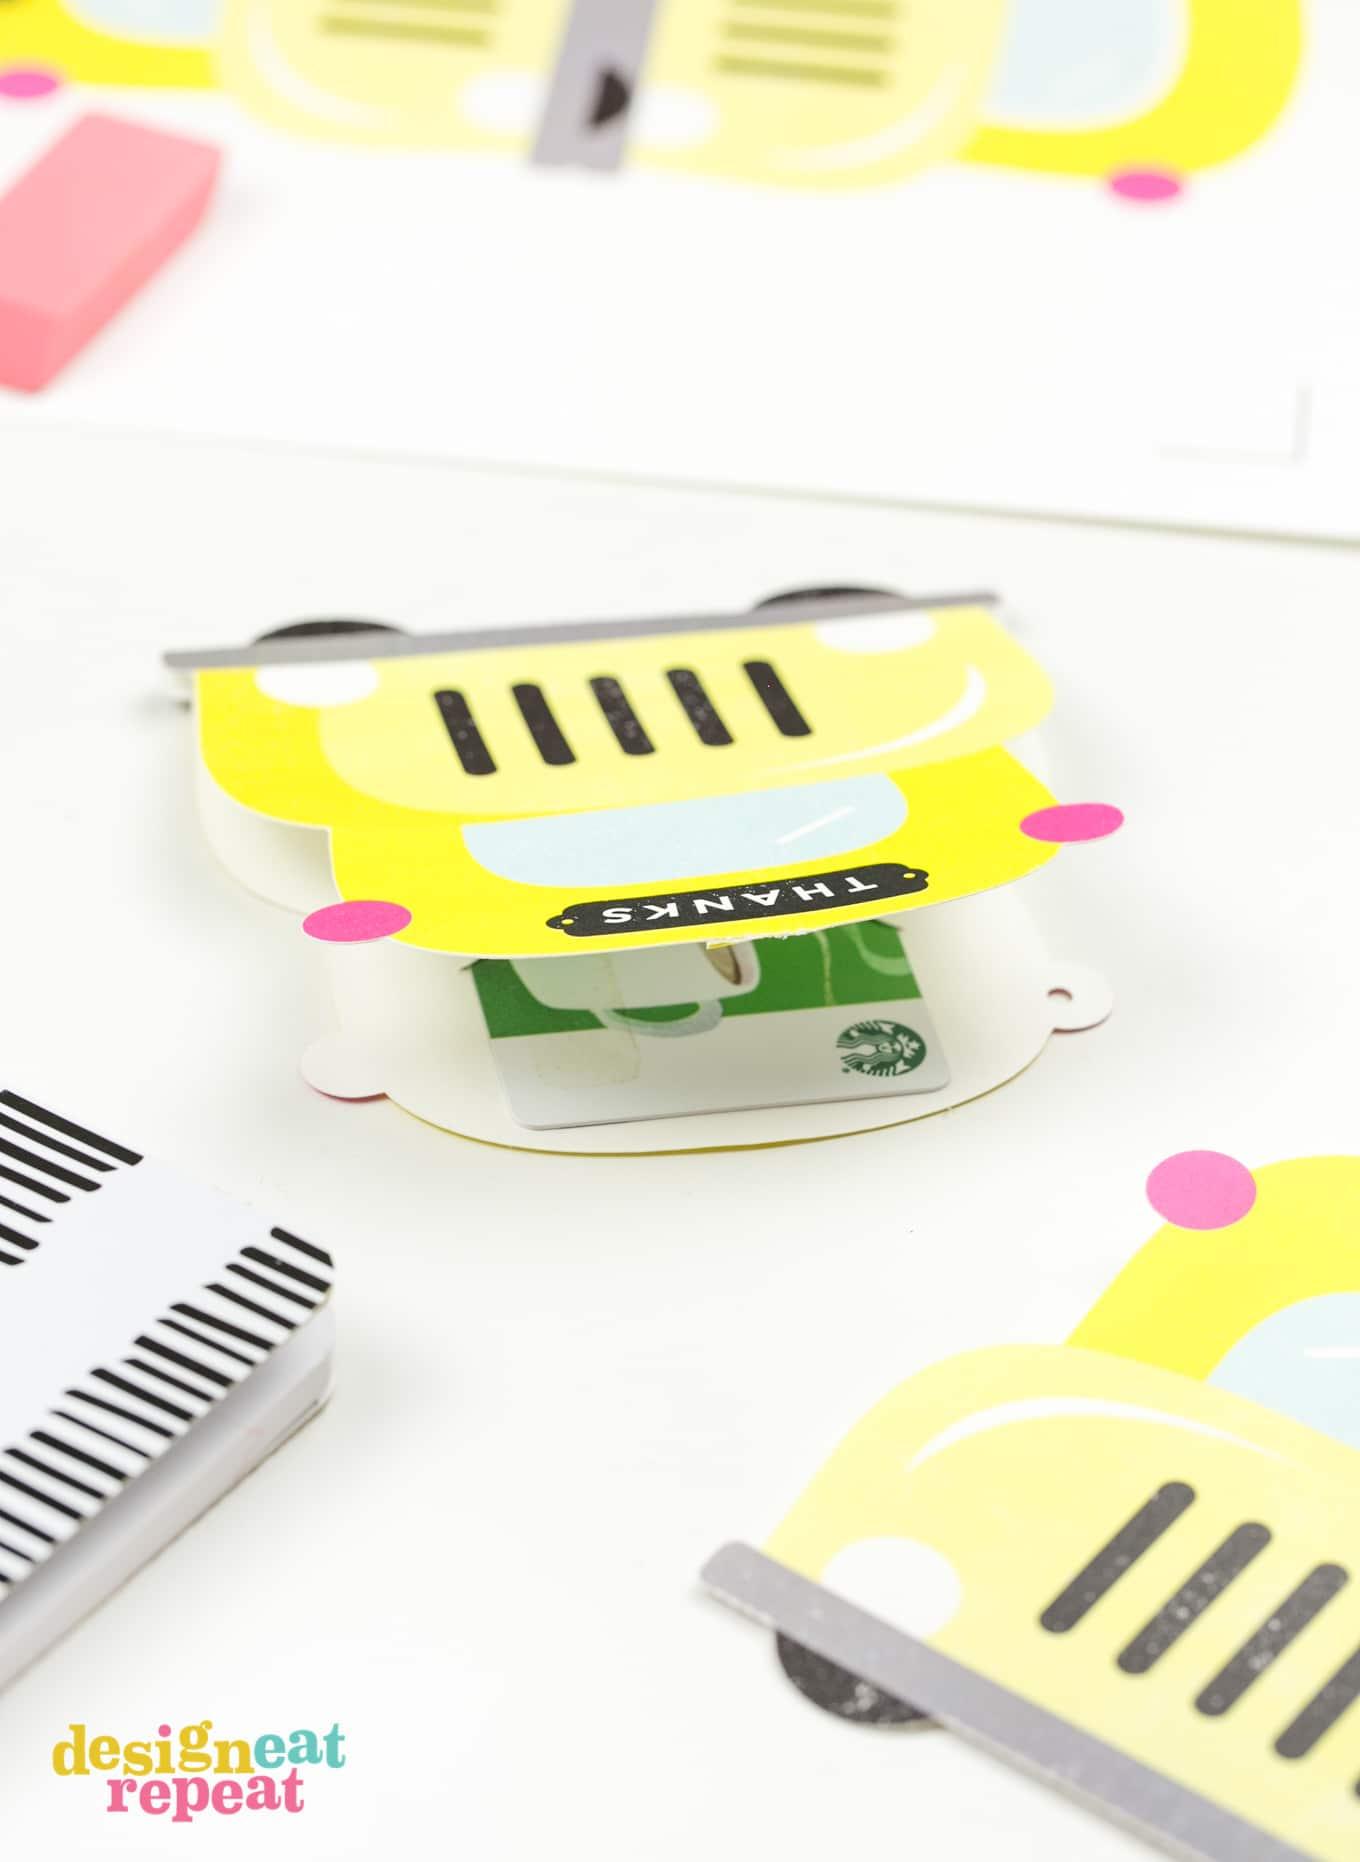 Yellow school bus printable teacher gift card holder with starbucks gift card.